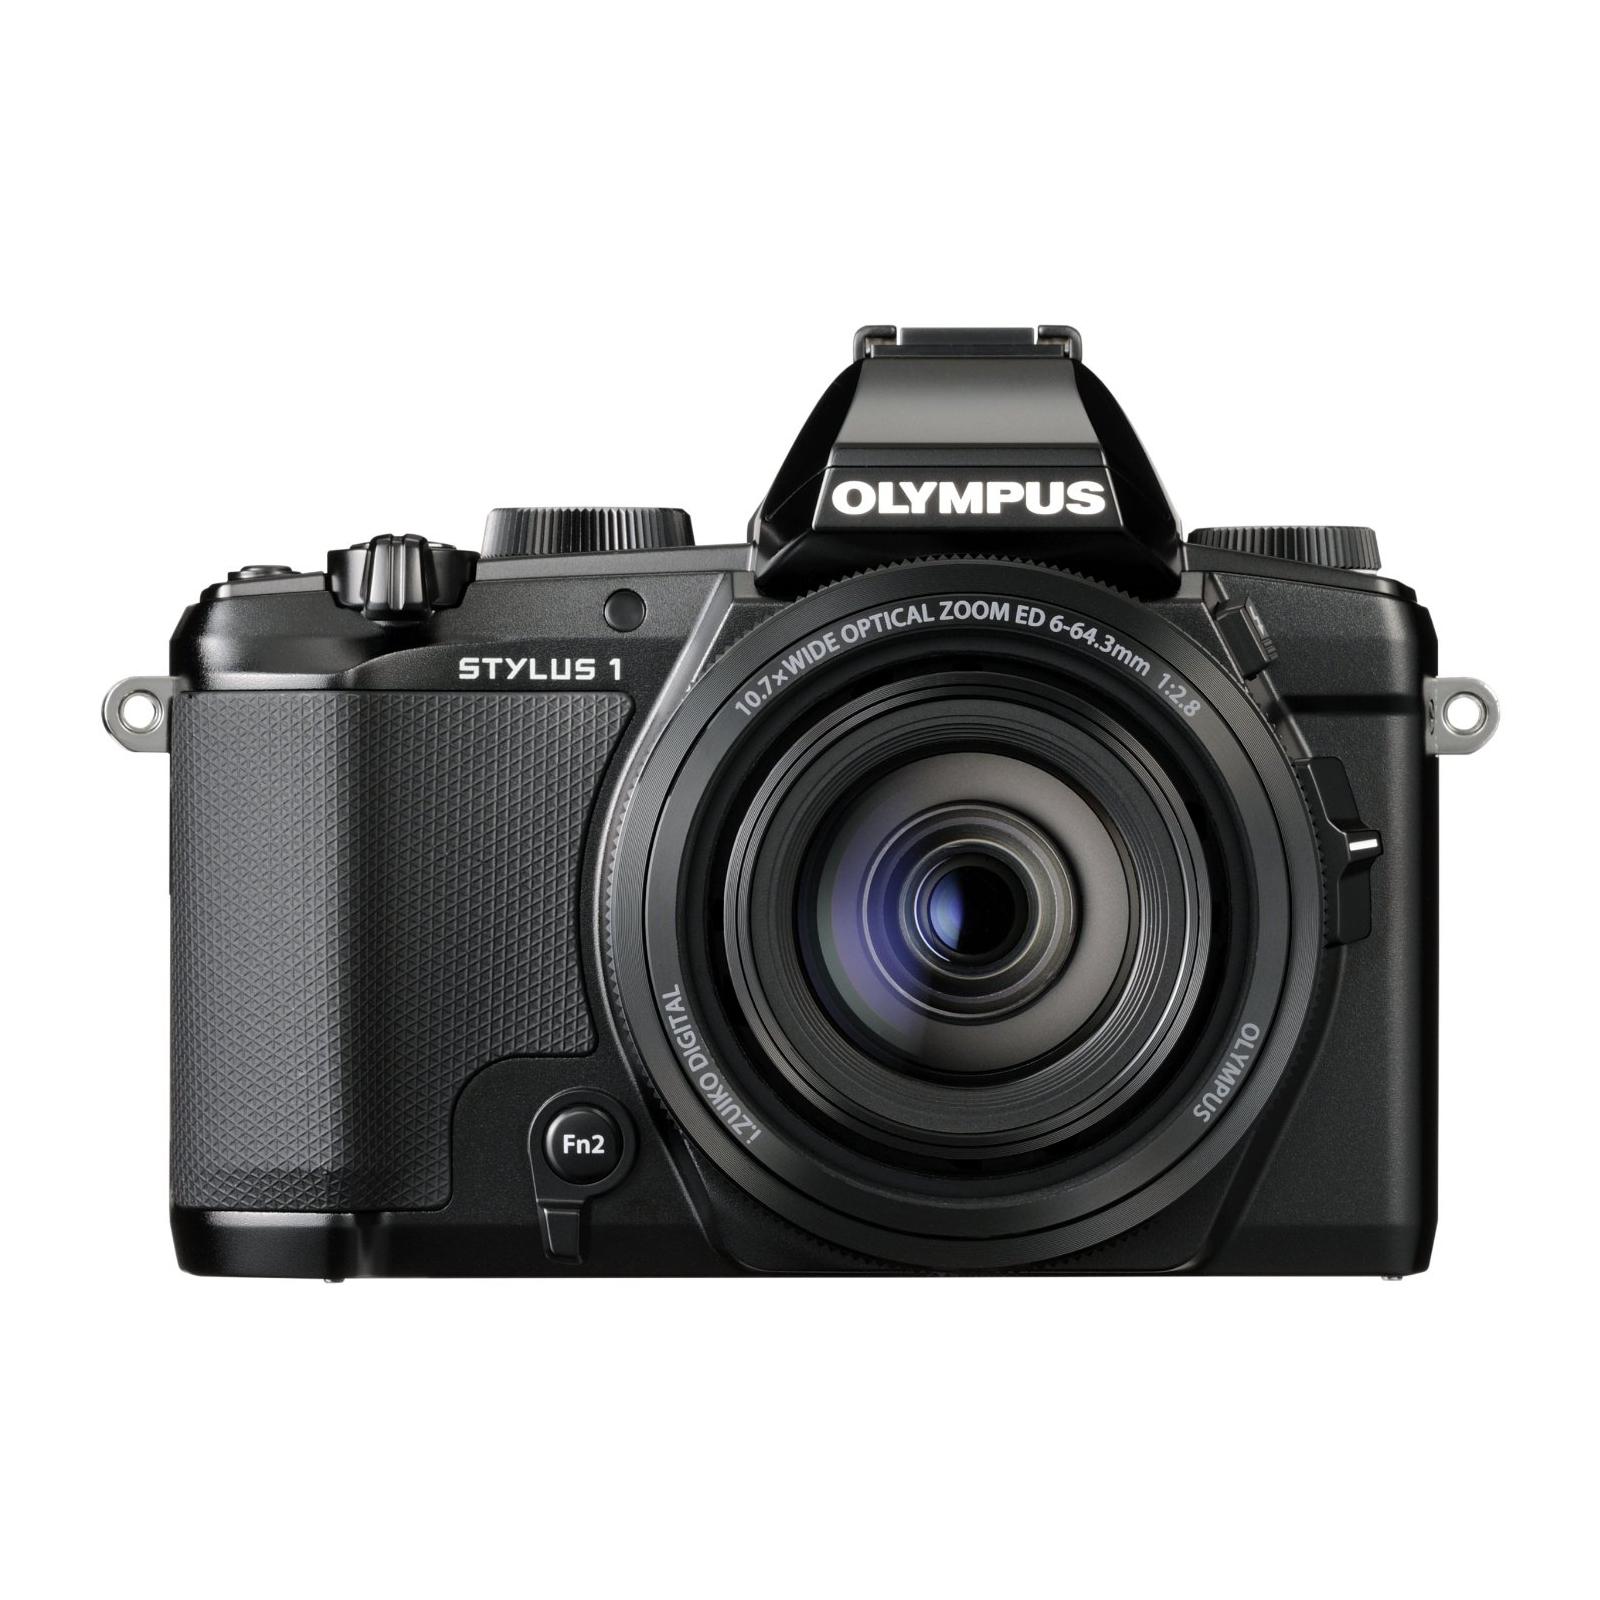 Цифровой фотоаппарат OLYMPUS STYLUS 1 Black (V109010BE000)